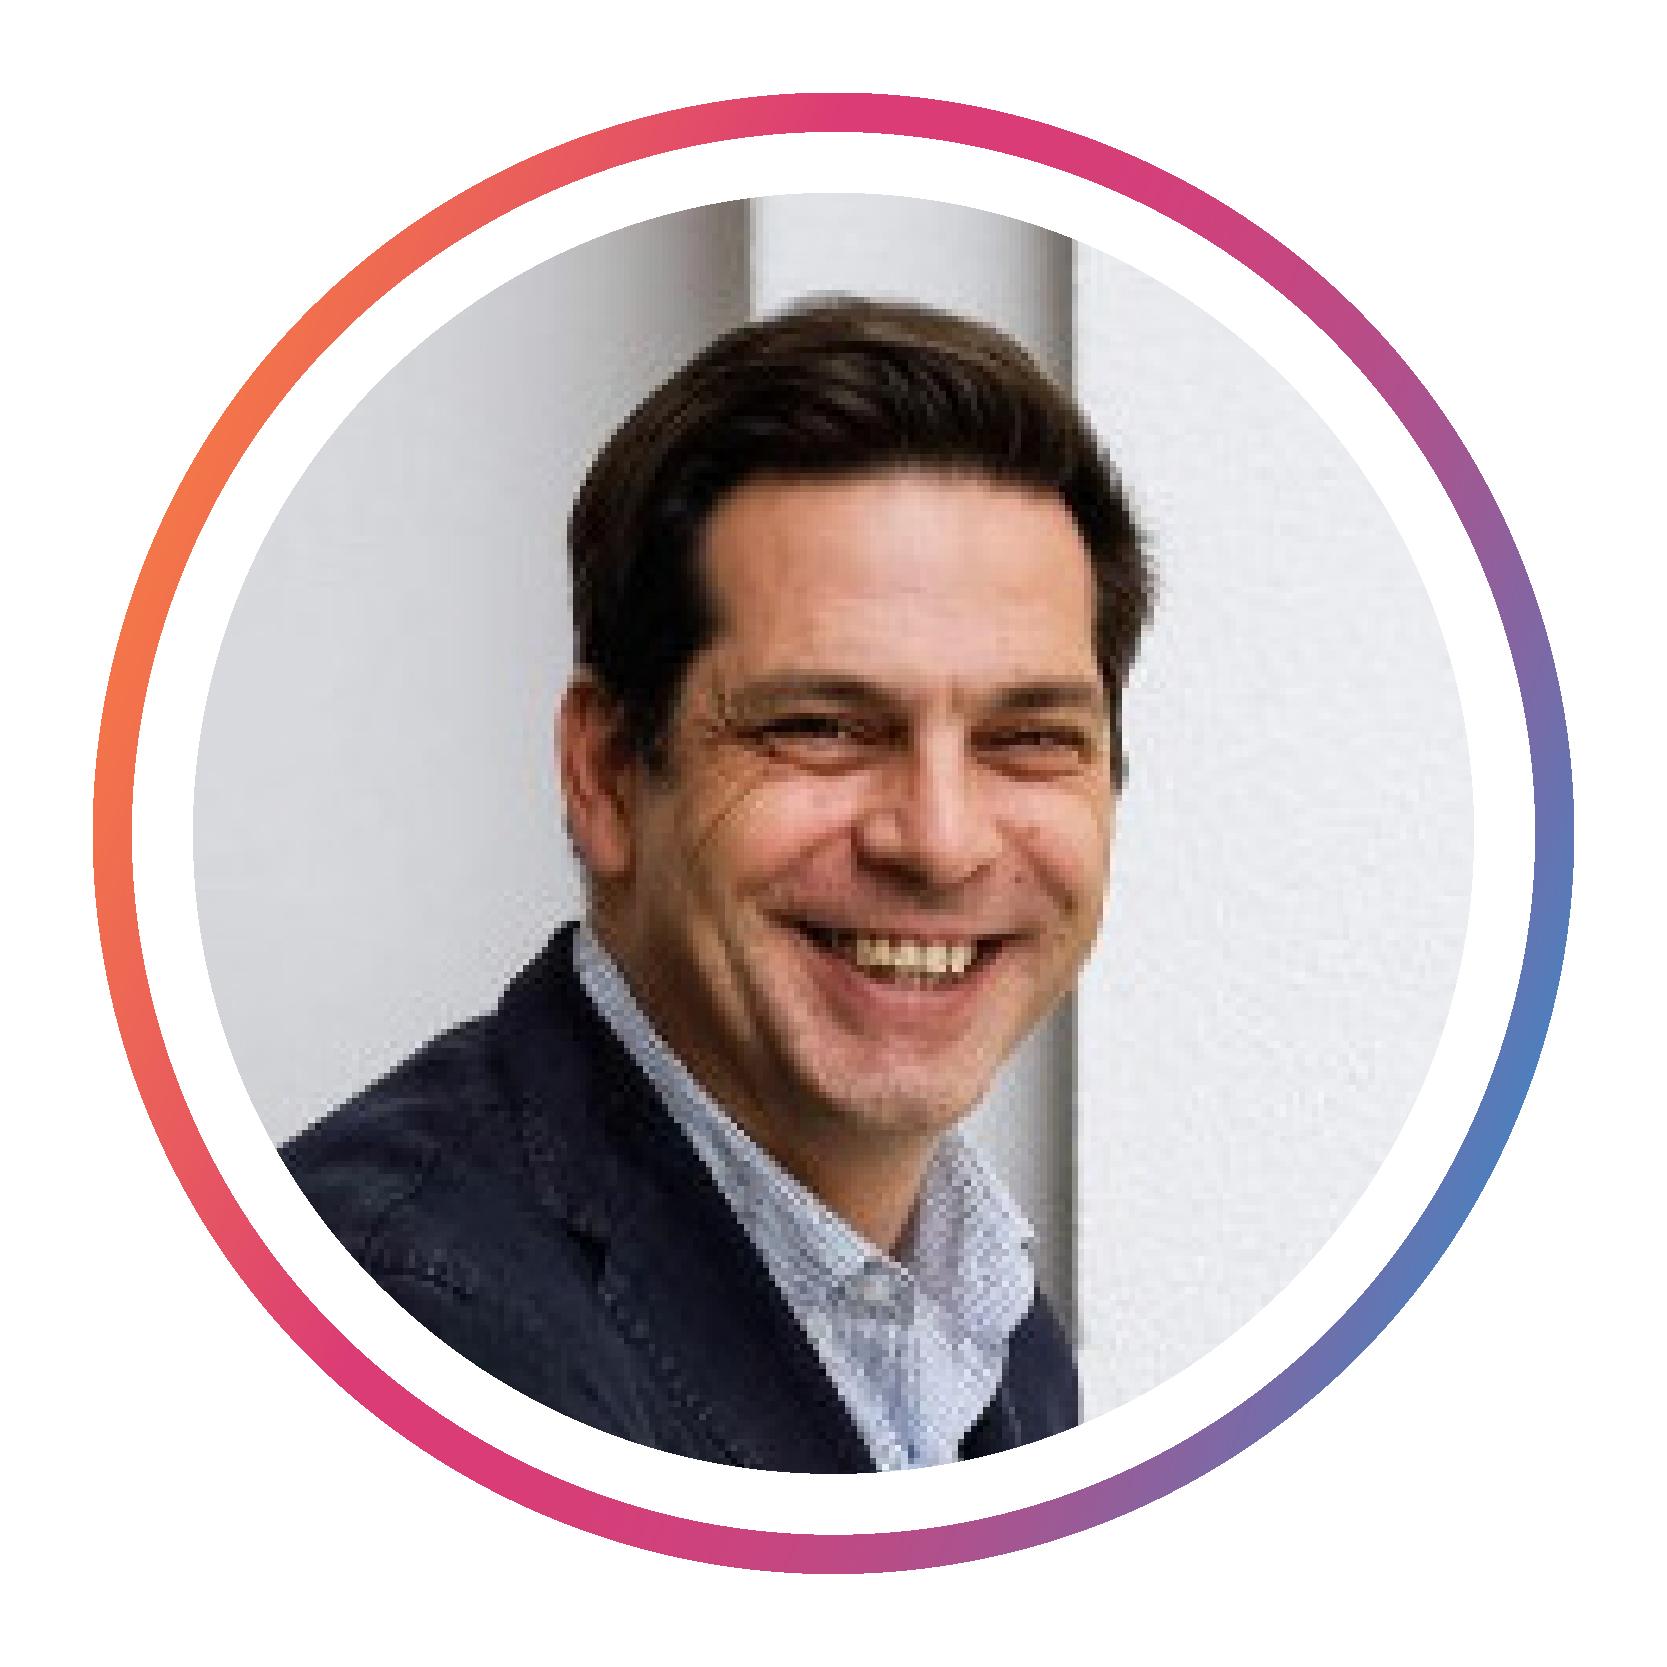 Robin Teigland | Digital Transformation, Blockchain, Sustainability Expert